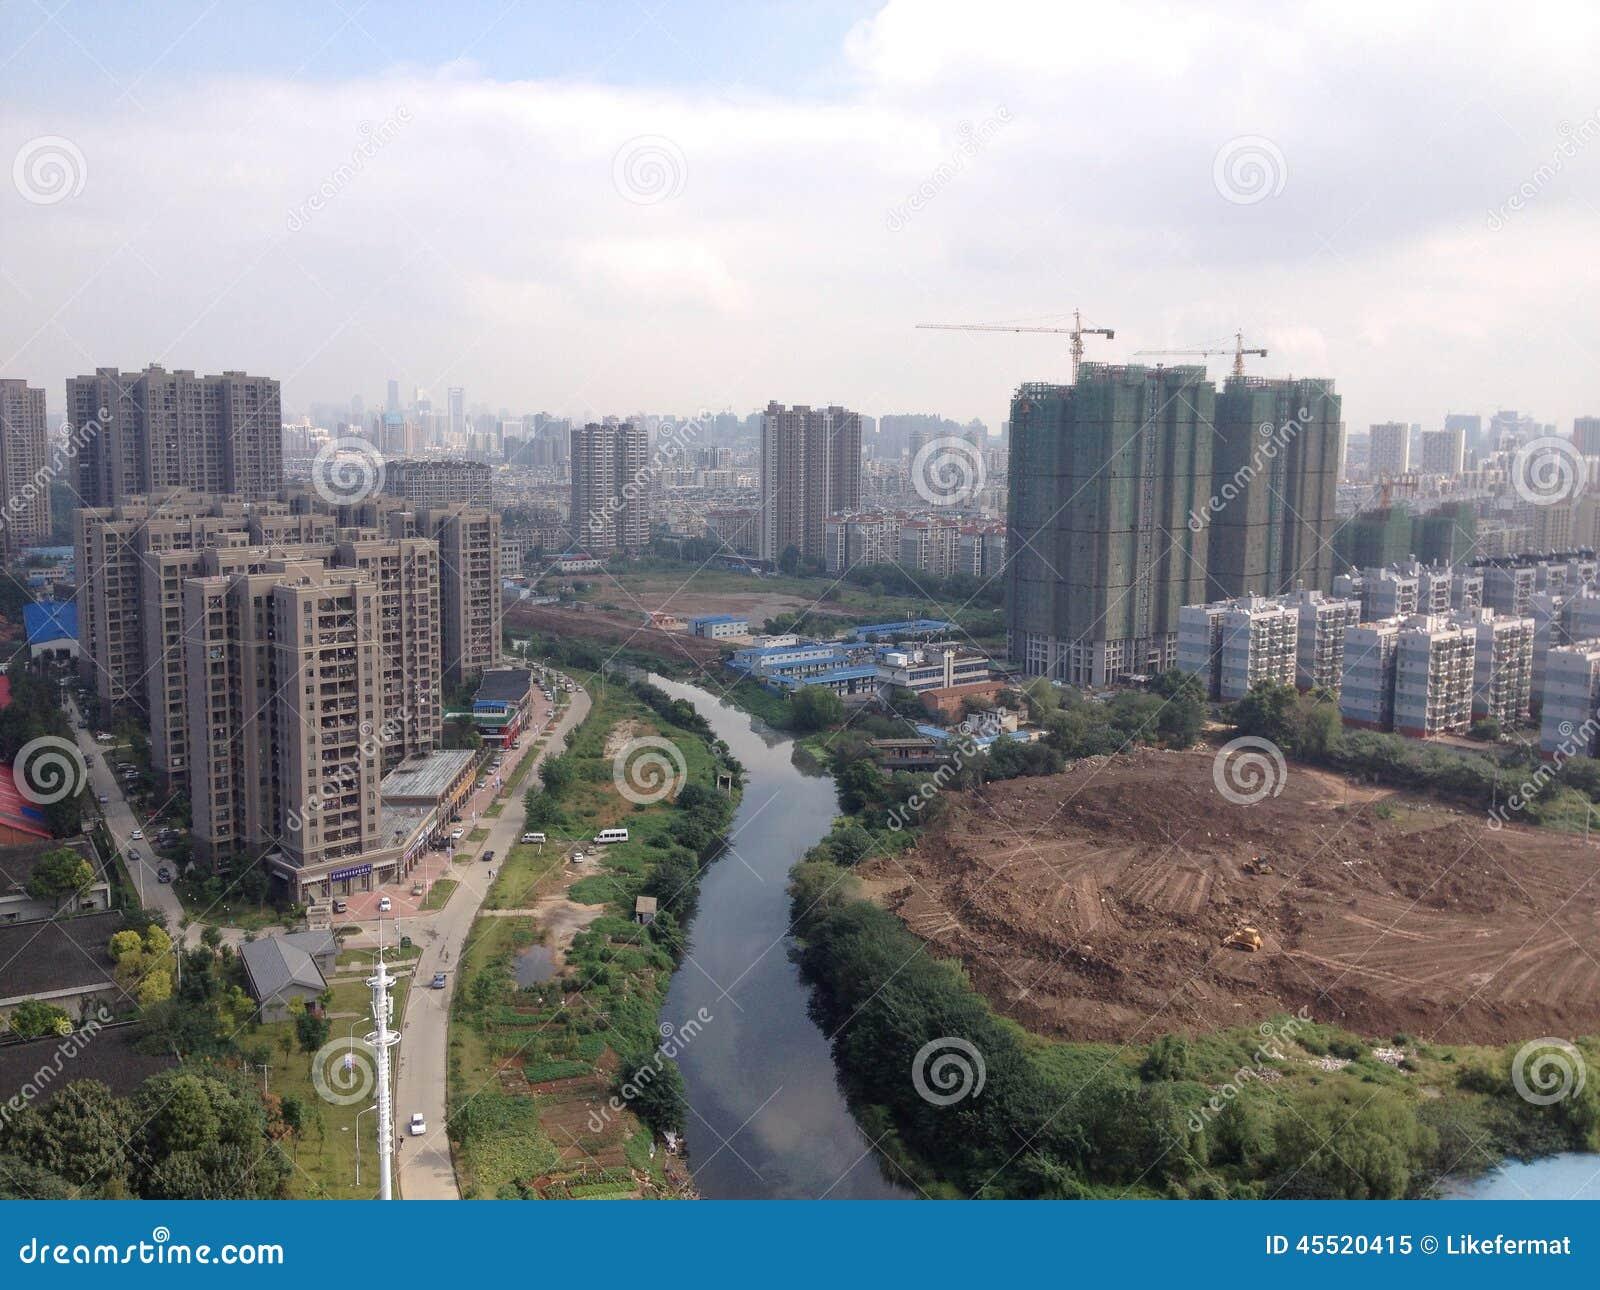 Wuhan city skyline